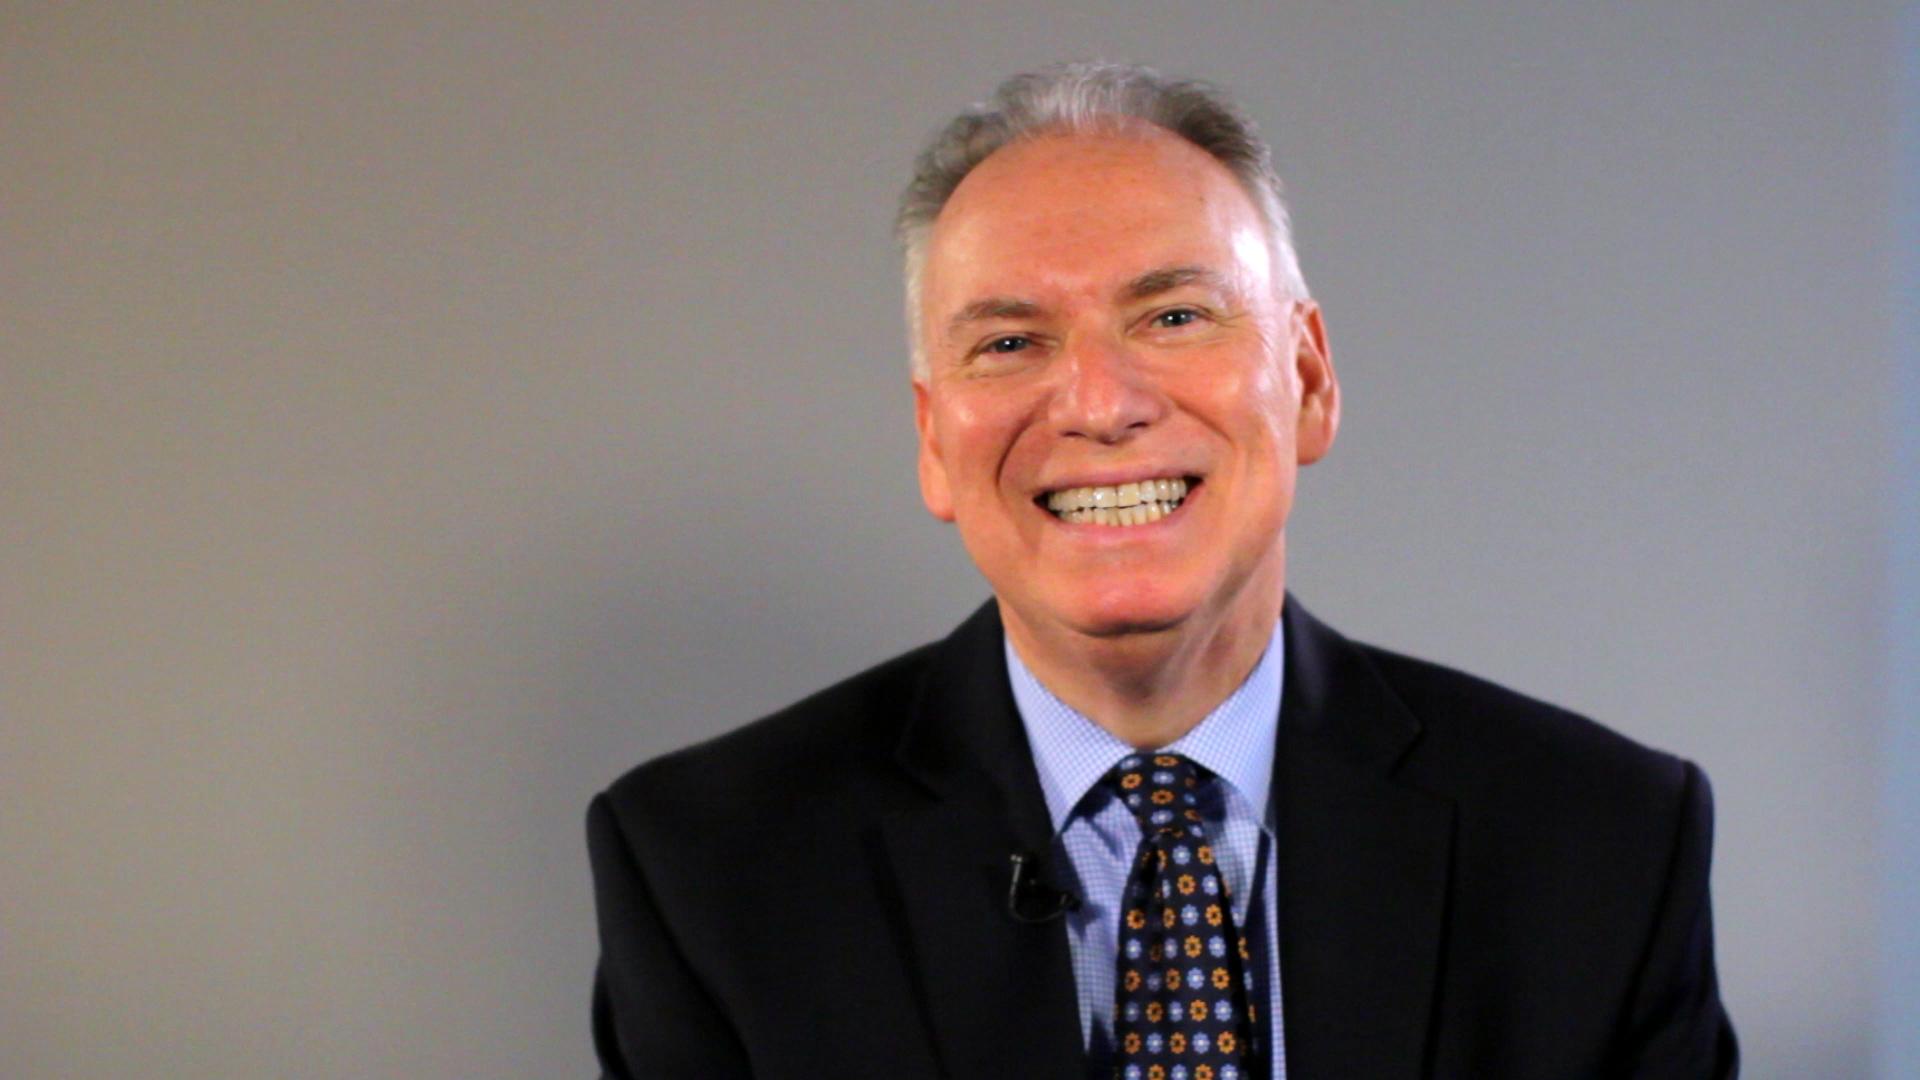 Xerox Technology President Jeff Jacobson Touts Xerox Diversification